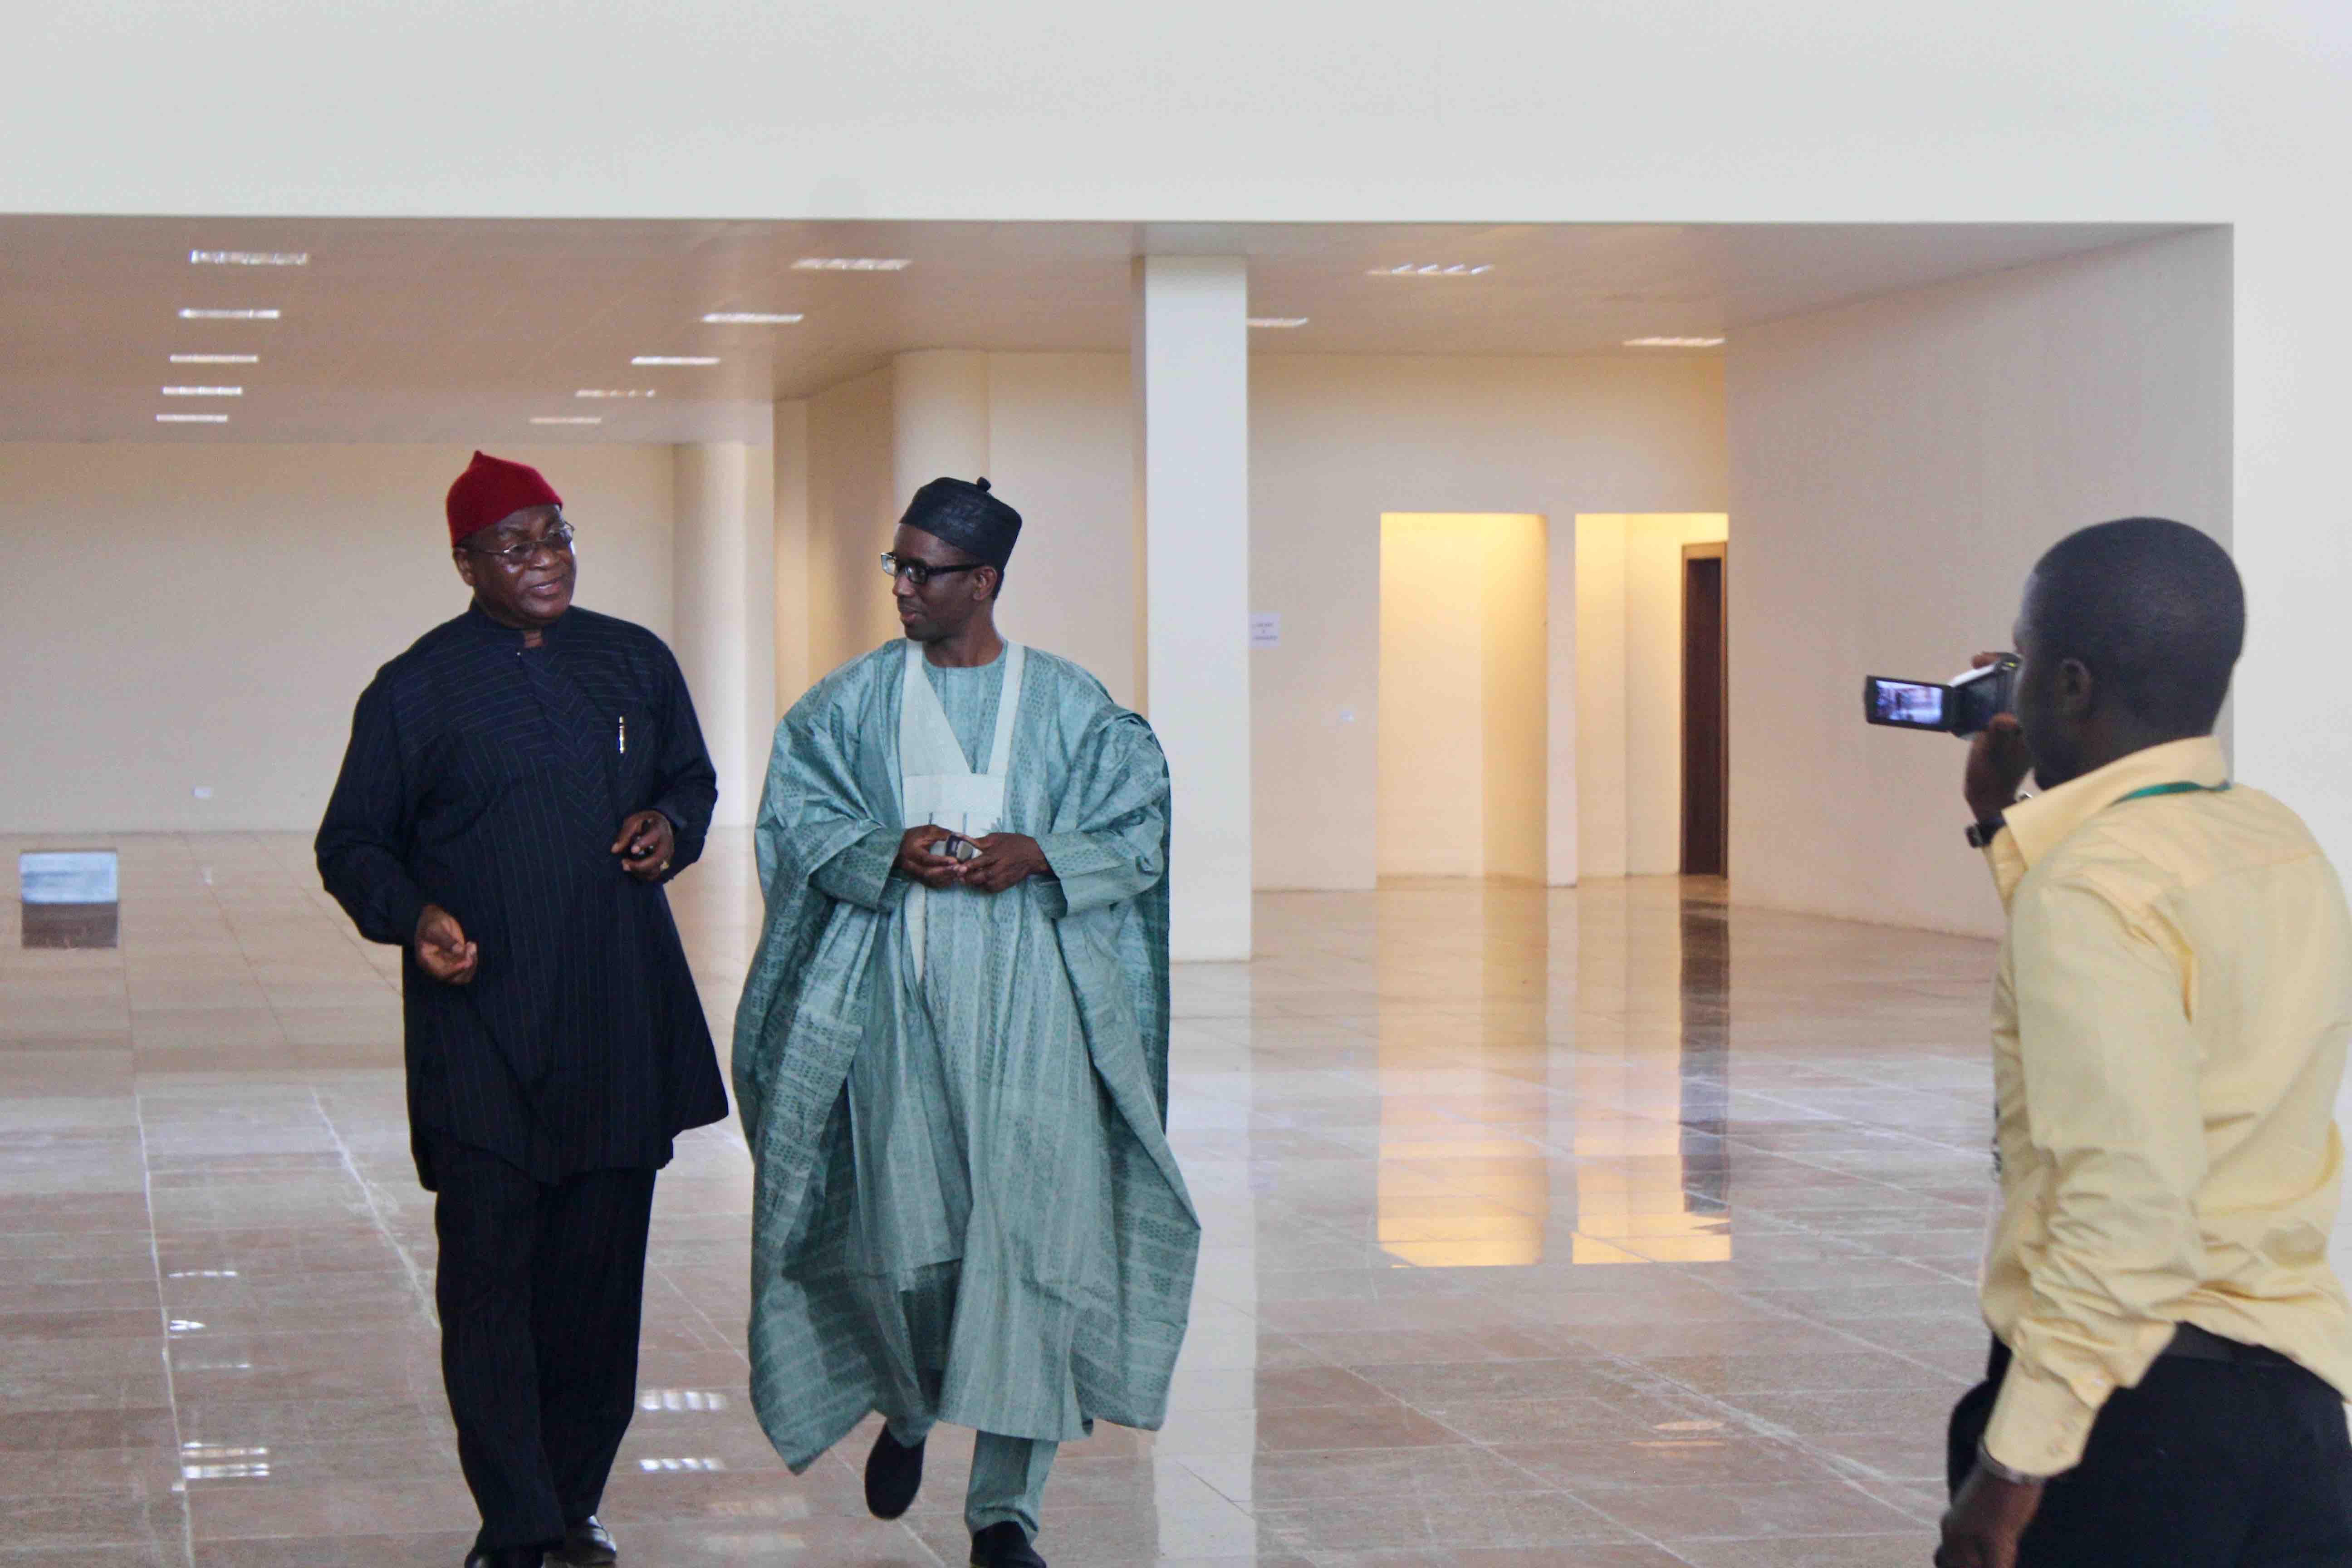 Dr. Sunny Ugochukwu and Mallam Nuhu Ribadu, Asaba International Airport, Asaba, Delta State, Nigeria. #JujuFilms